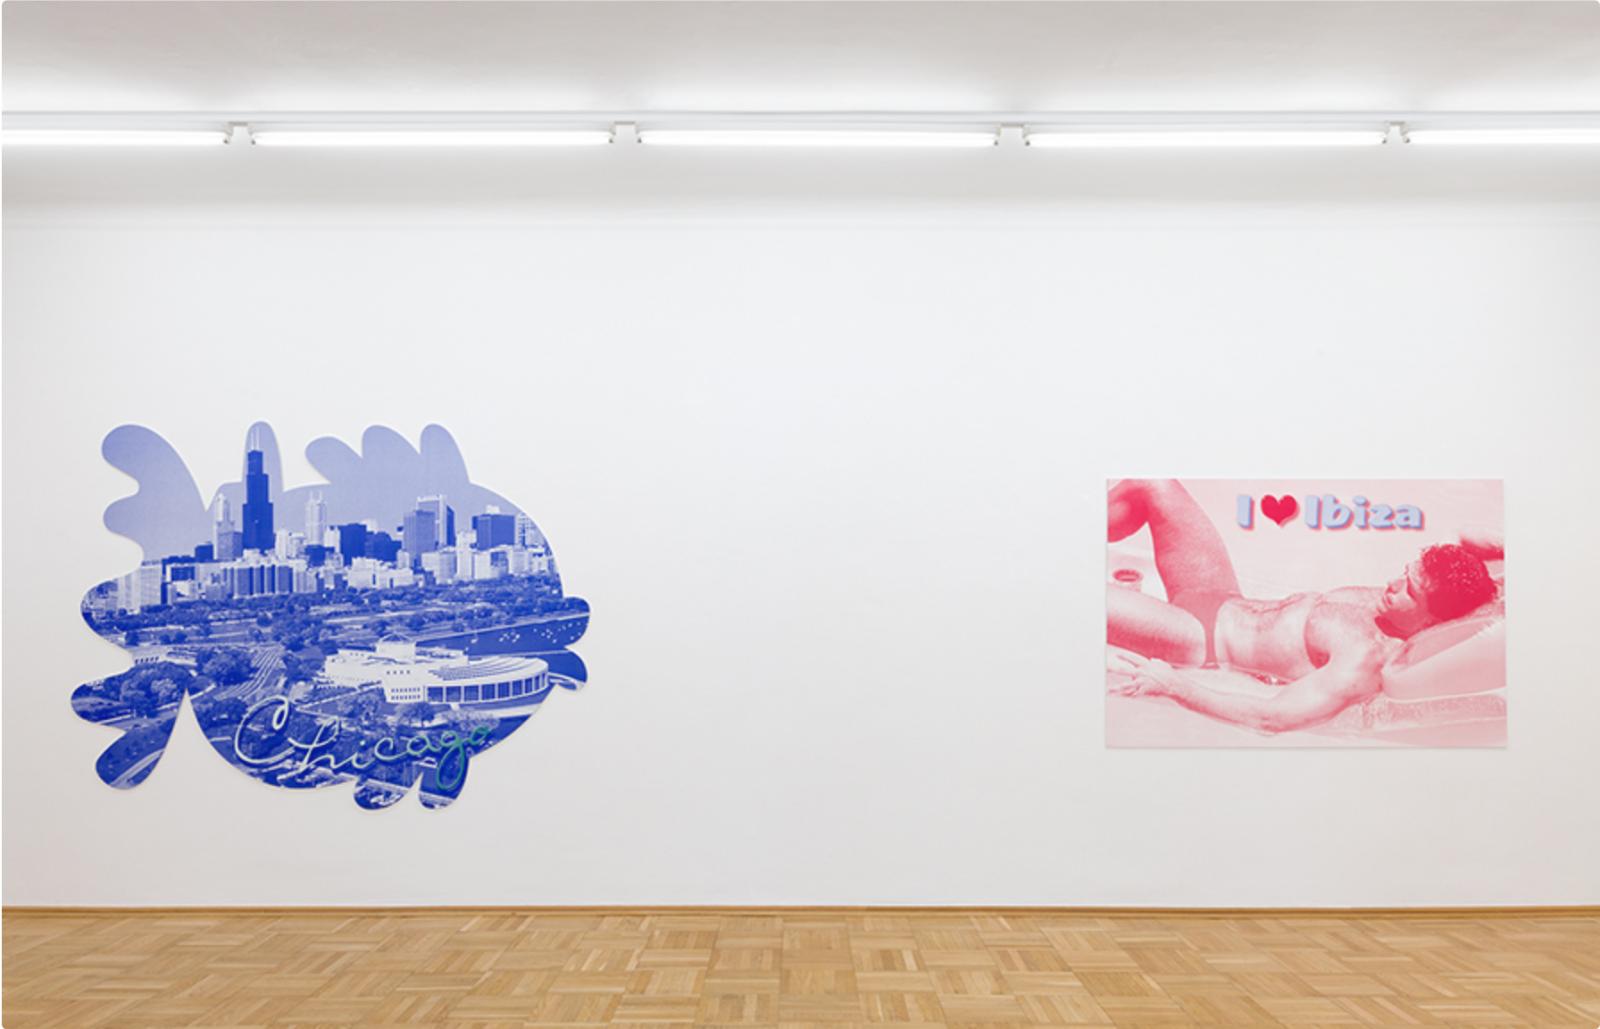 "Katharina Fritsch /1. Postkarte (Chicago)/(2001/2002, left) /7. Postkarte (Ibiza)/ (2007, right) Photo: Nic Tenwinggenhorn; Courtesy Matthew Marks Gallery  ""Chicago, Ibiza etc."" curated by Robert Fleck, Galerie nächst St. Stephan  Rosemarie Schwarzwälder"